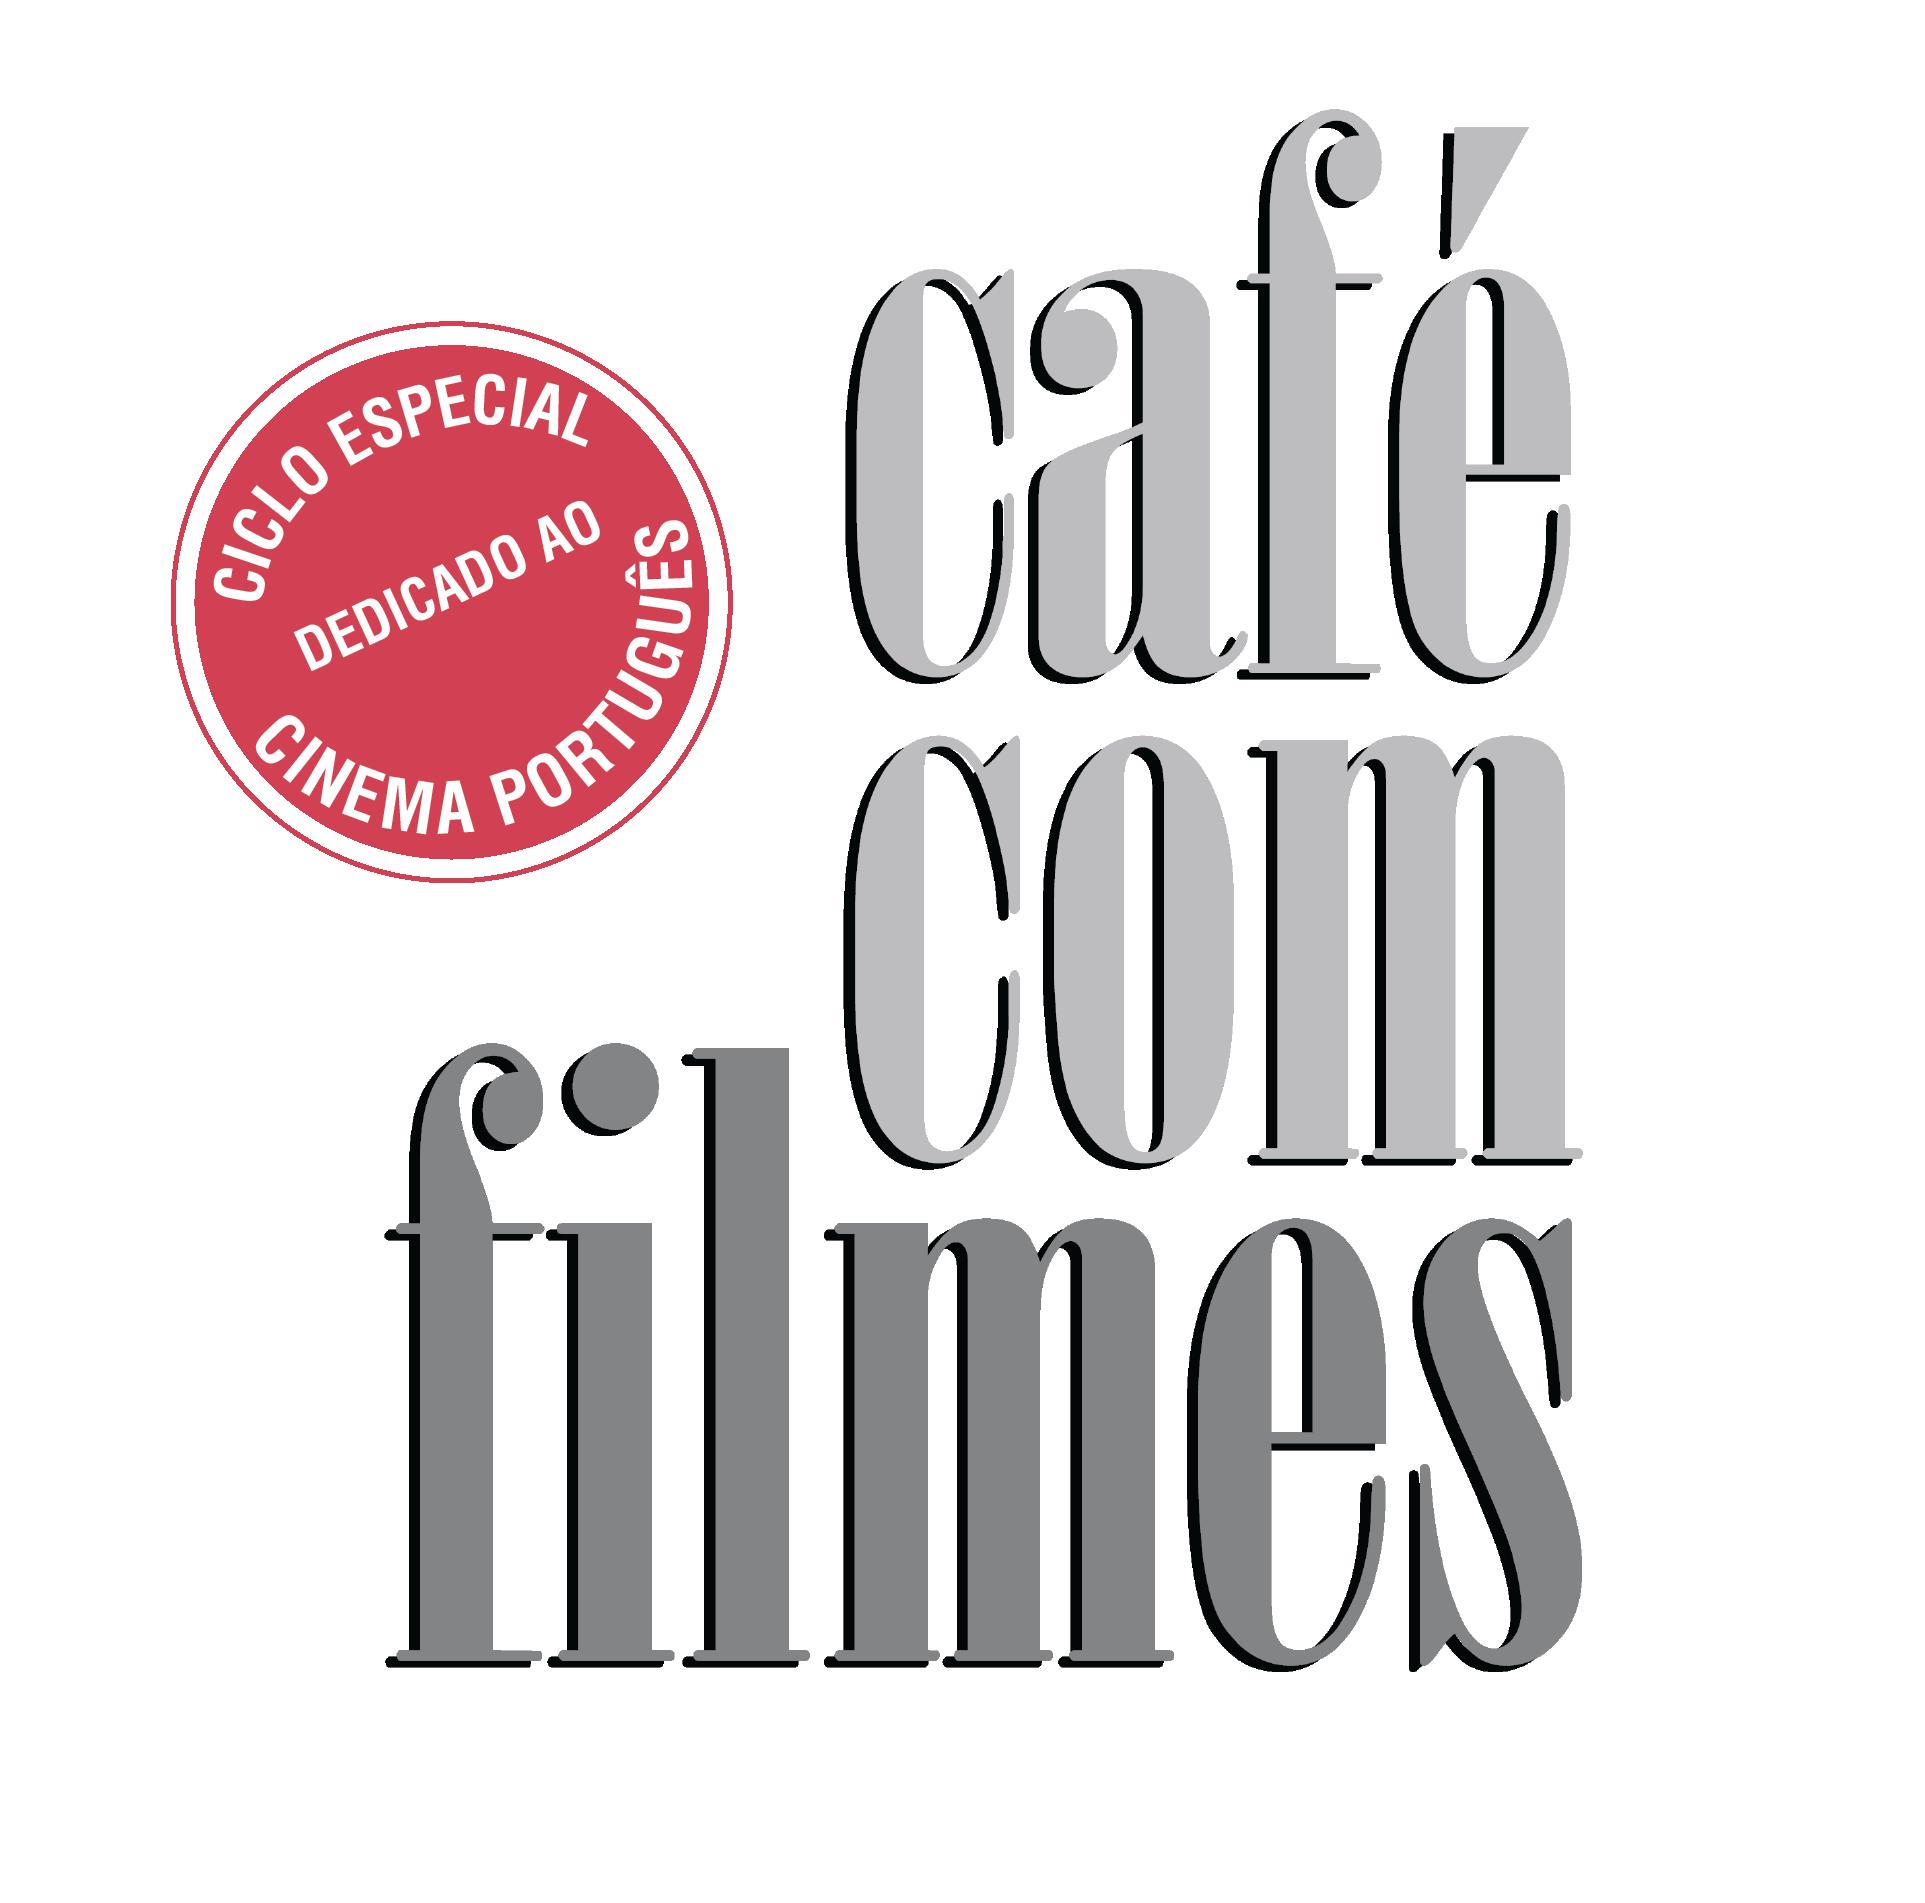 CafécFilmesCicloespecial.png